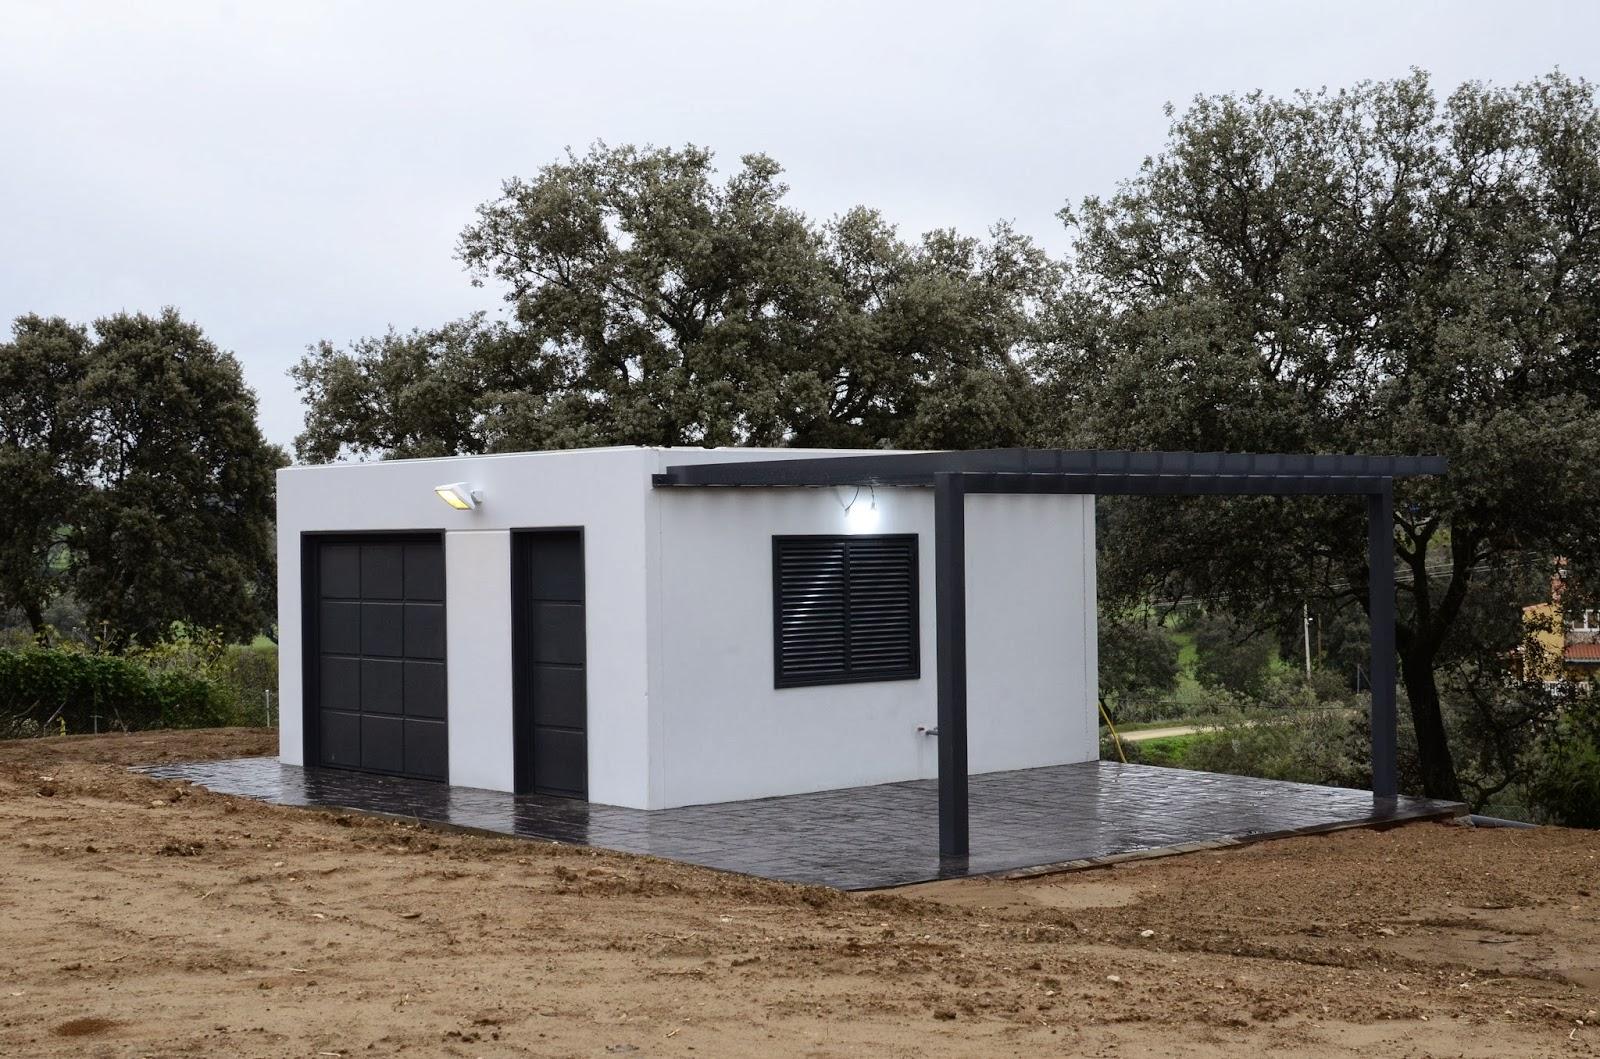 Casas prefabricadas baratas tu casa prefabricada a precios - Precios casa prefabricada ...